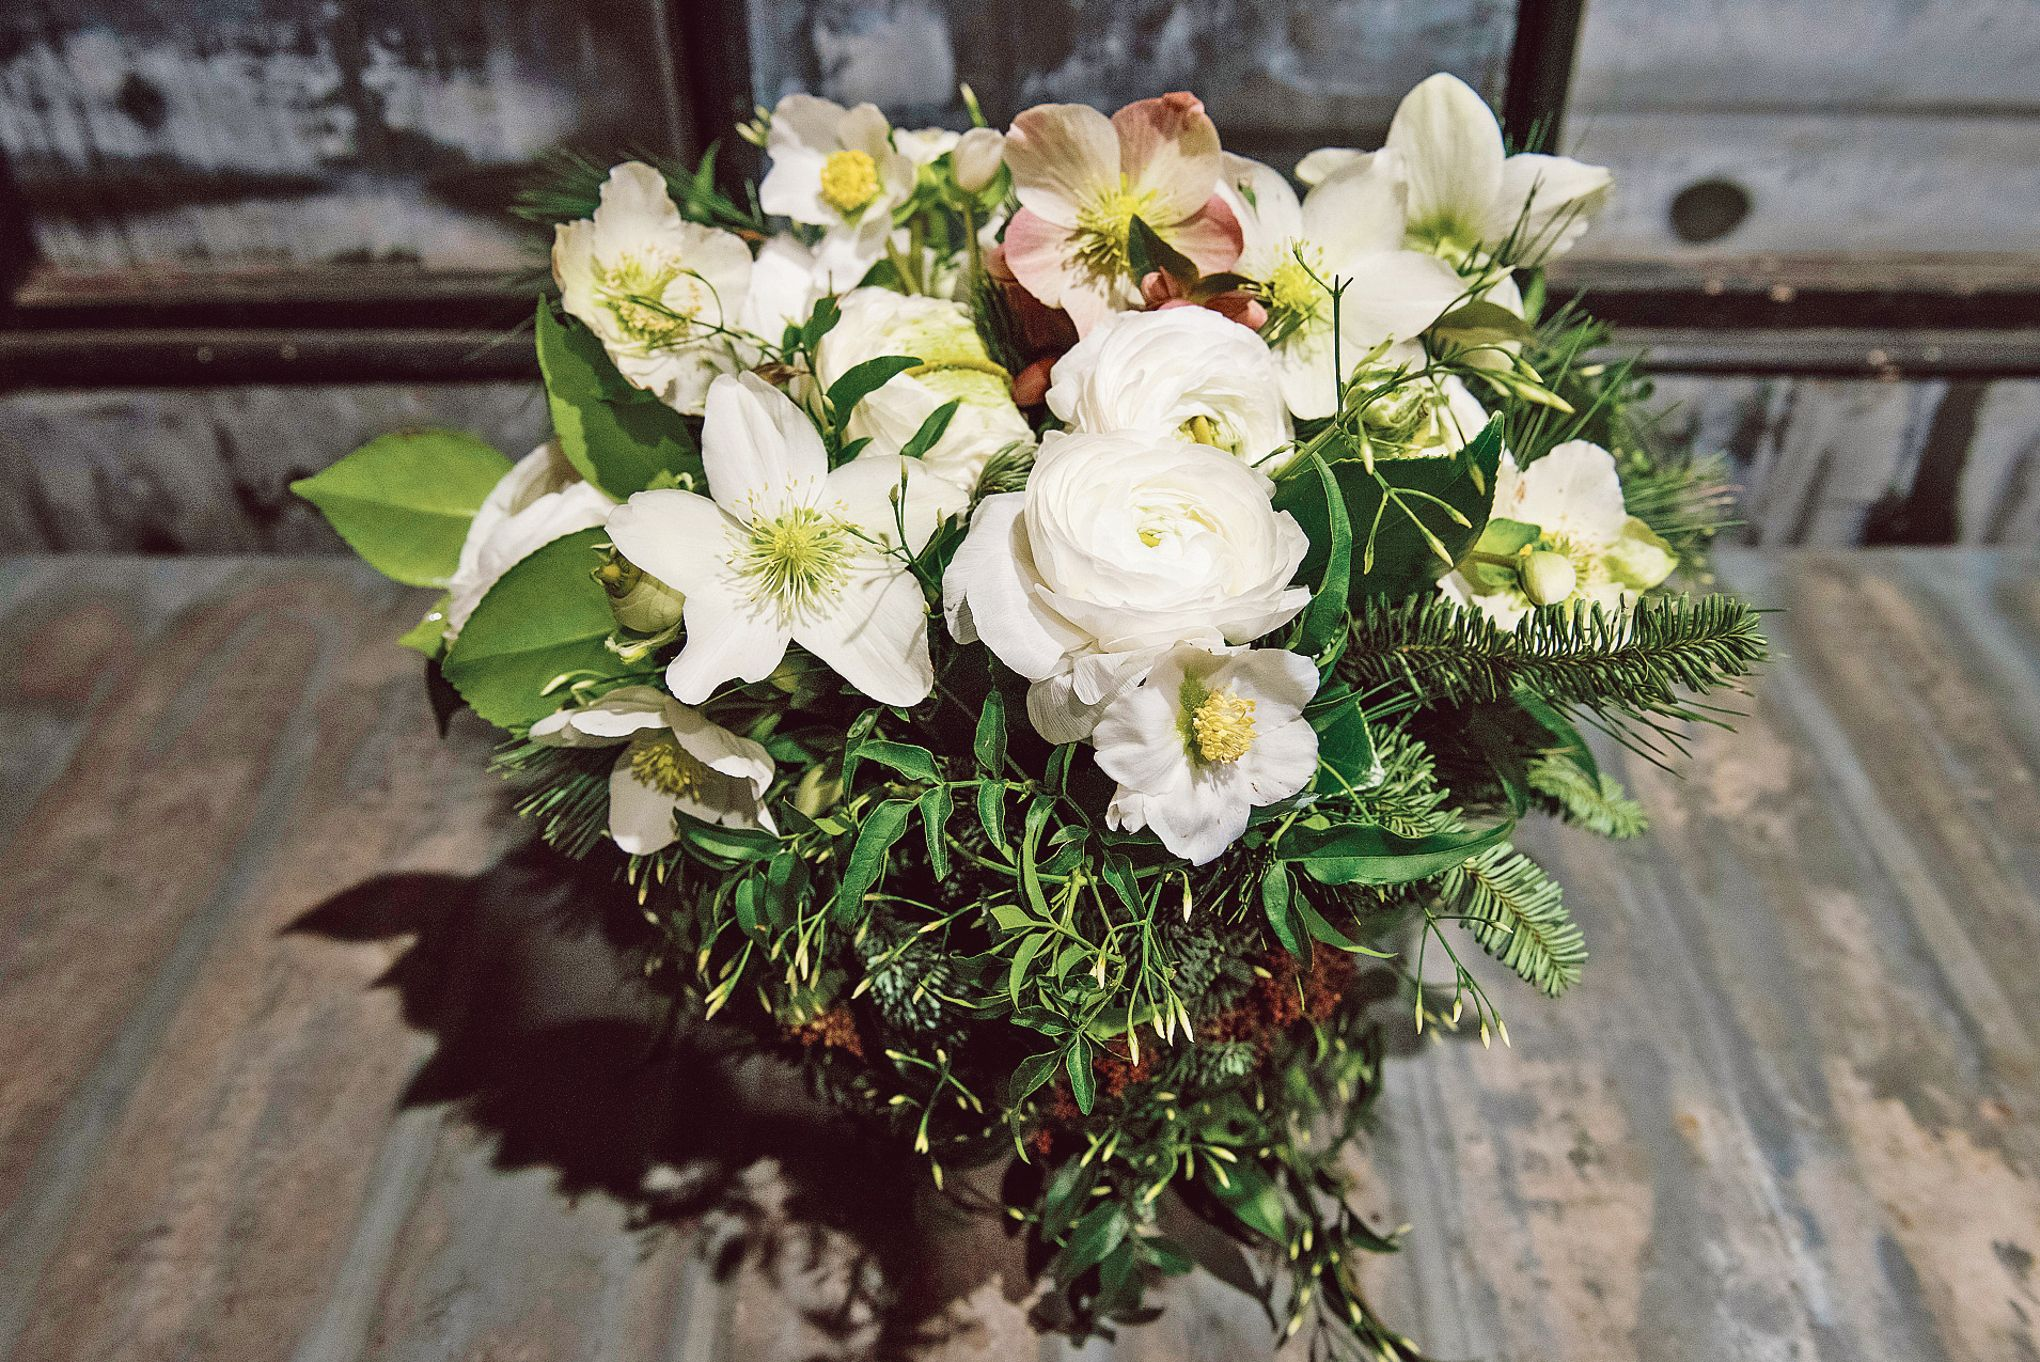 Hellebore Rose De Noel Entretien hellébore, la sublime rose de noël qui enchante l'hiver